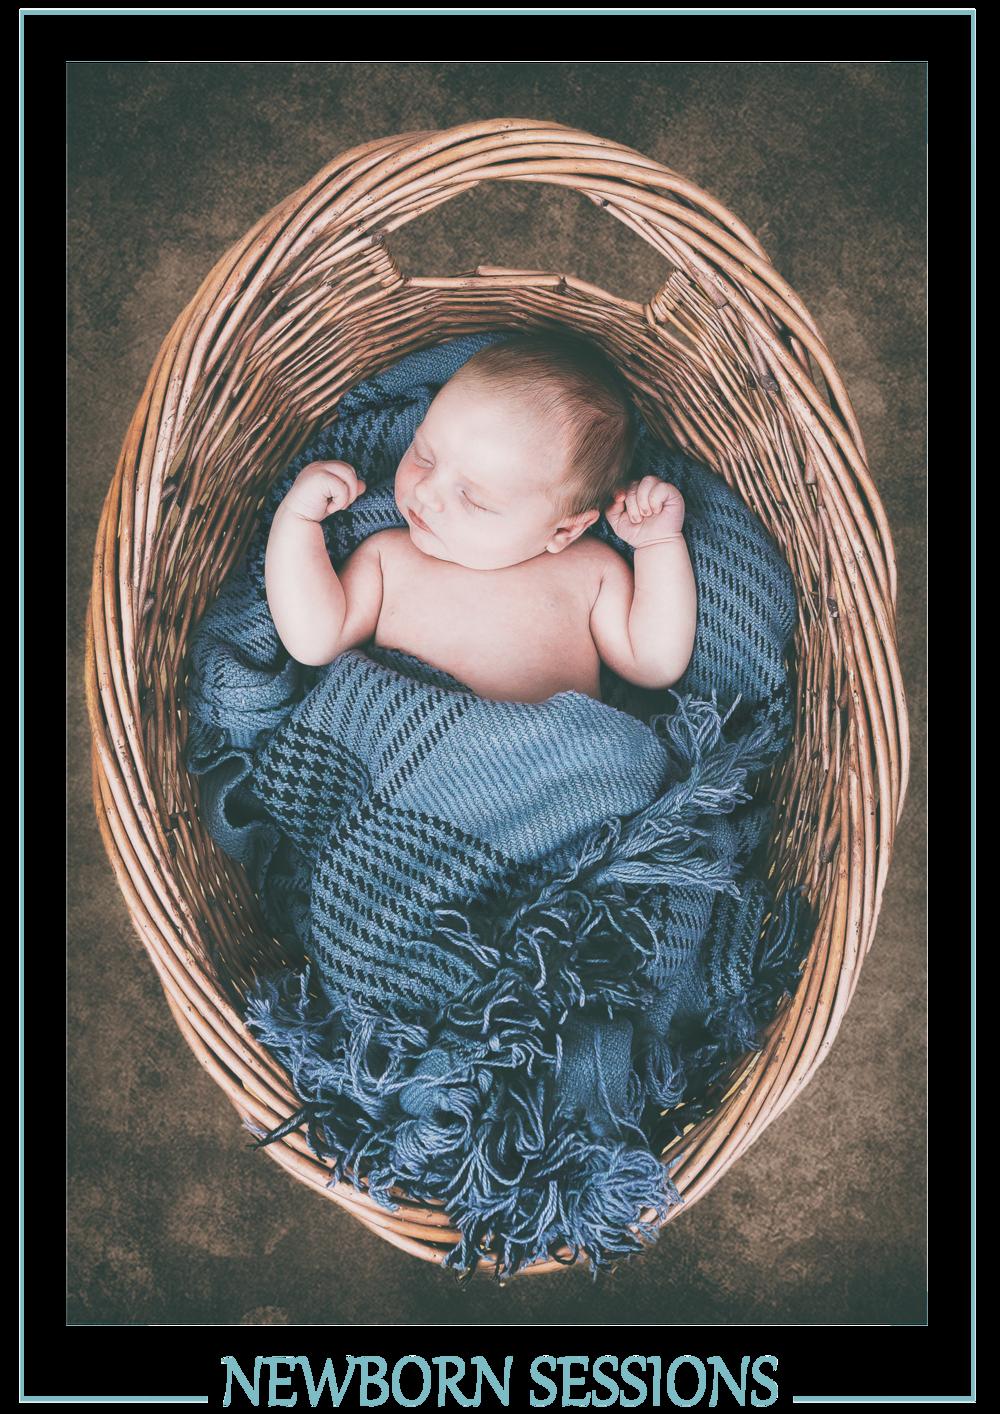 Explore The Newborn Sessions